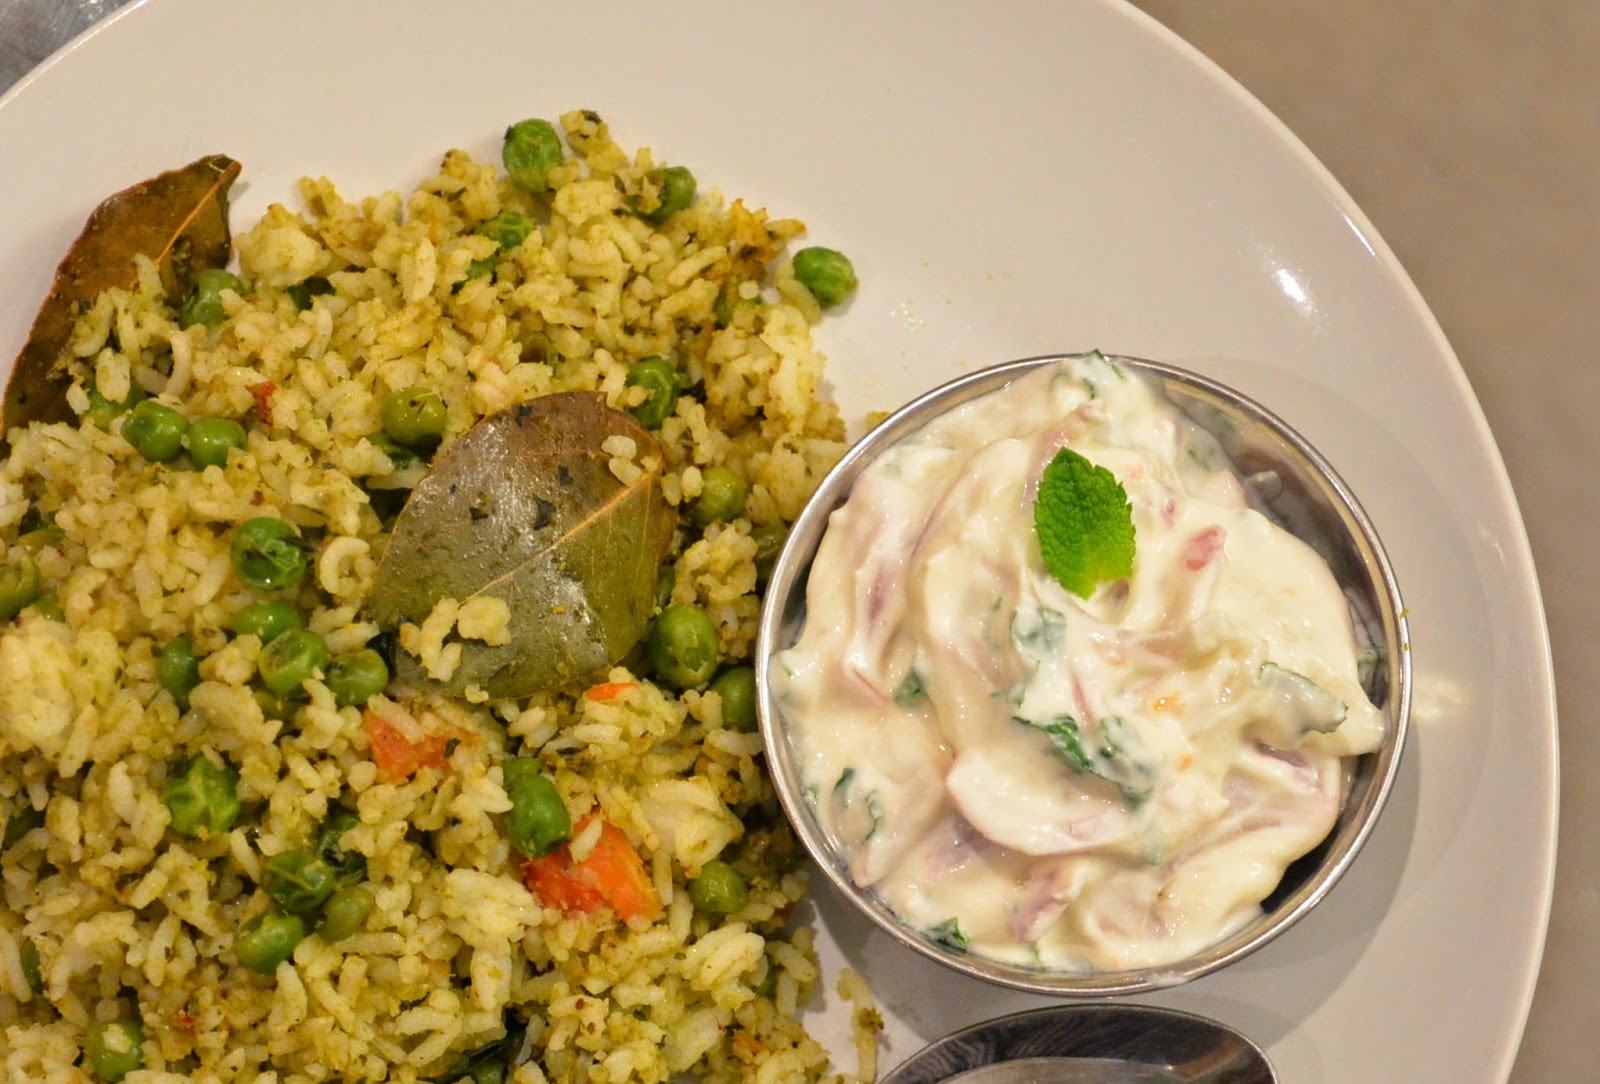 menthya bhath recipe, karnataka breakfast recipes, rice dish, pulav, pulao, Indian rice dish